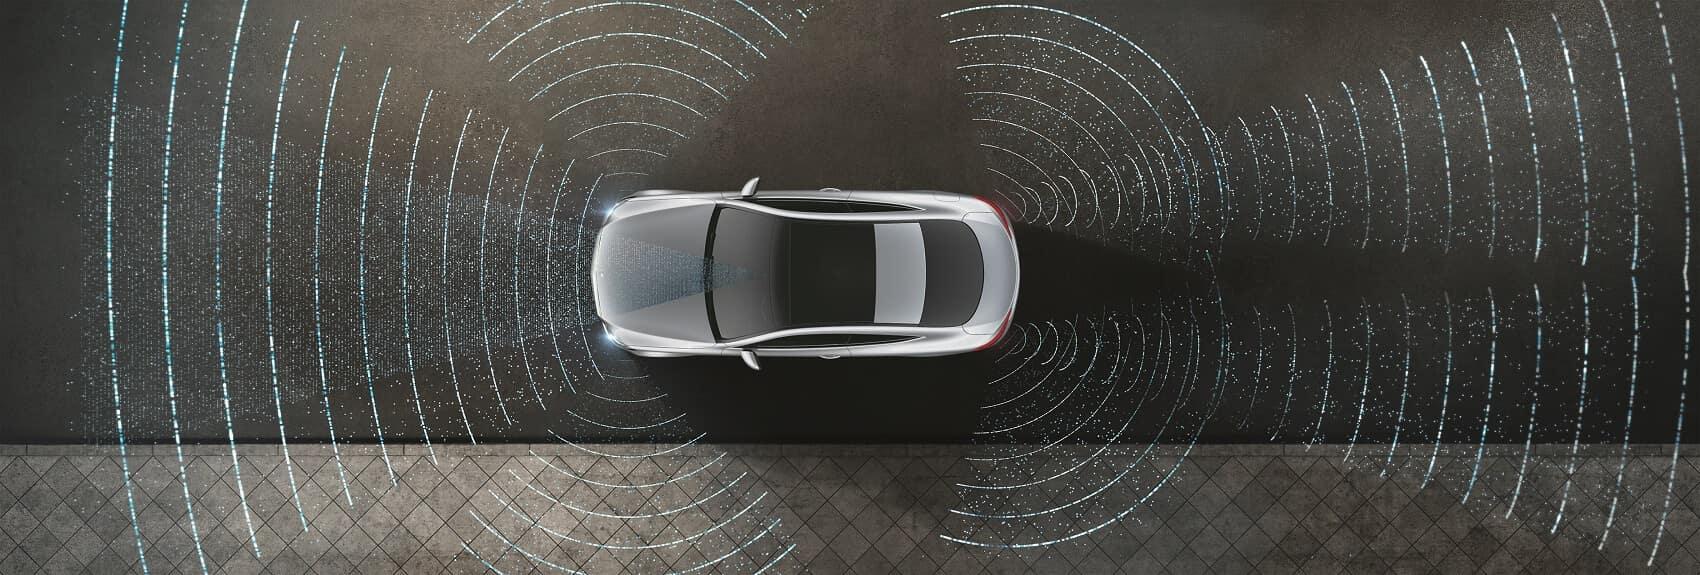 Mercedes C-Class Safety